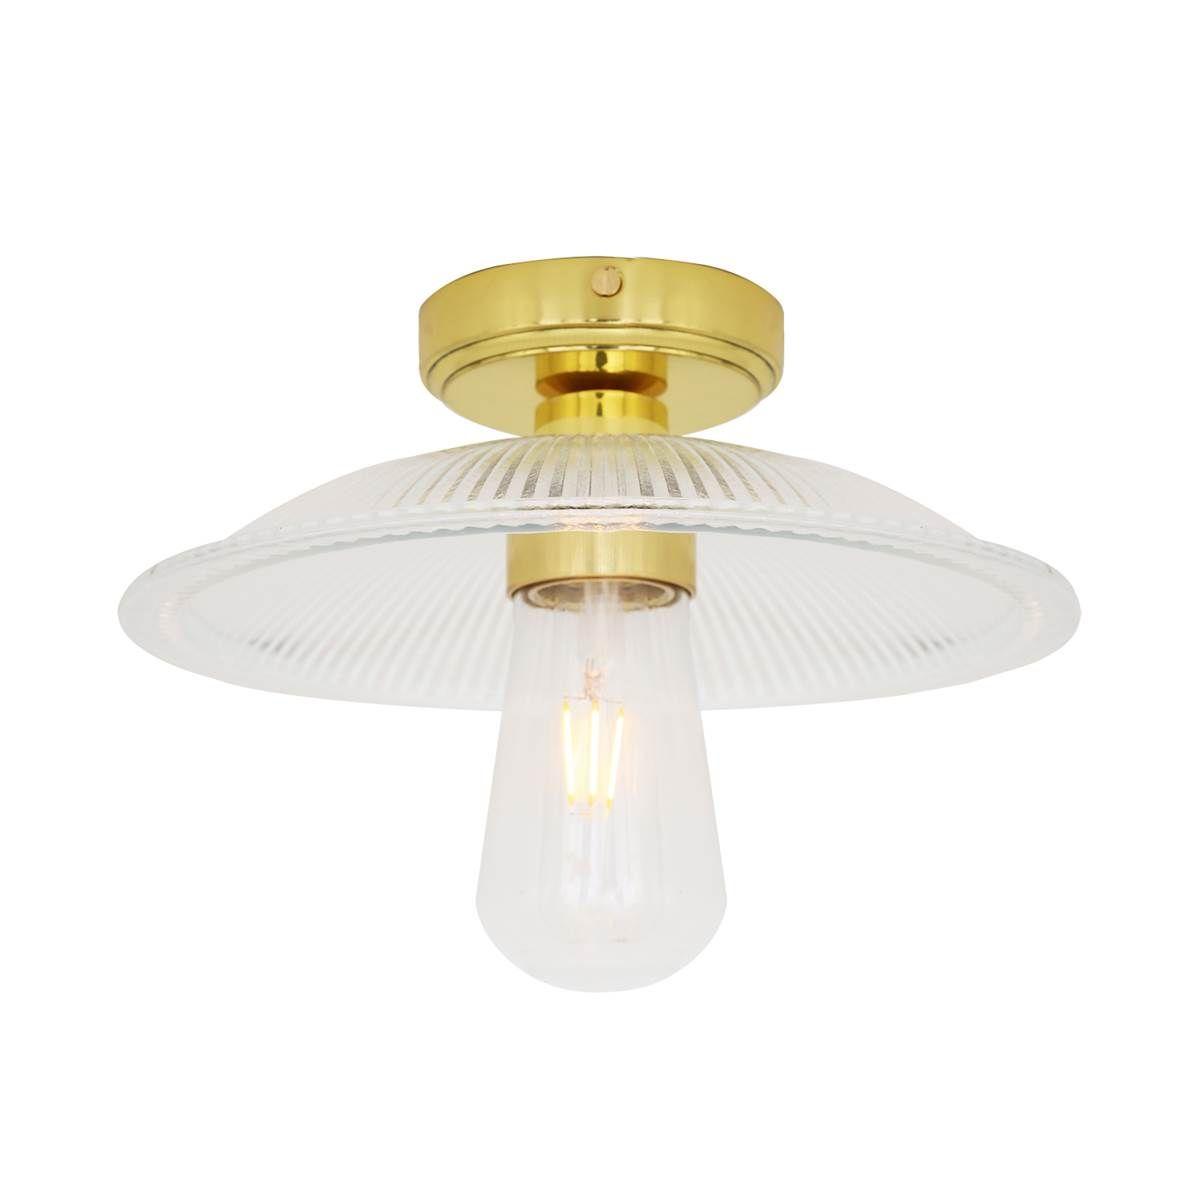 Gal Ceiling Light Ip65 Ceiling Lights Brass Lamp Bathroom Ceiling Light